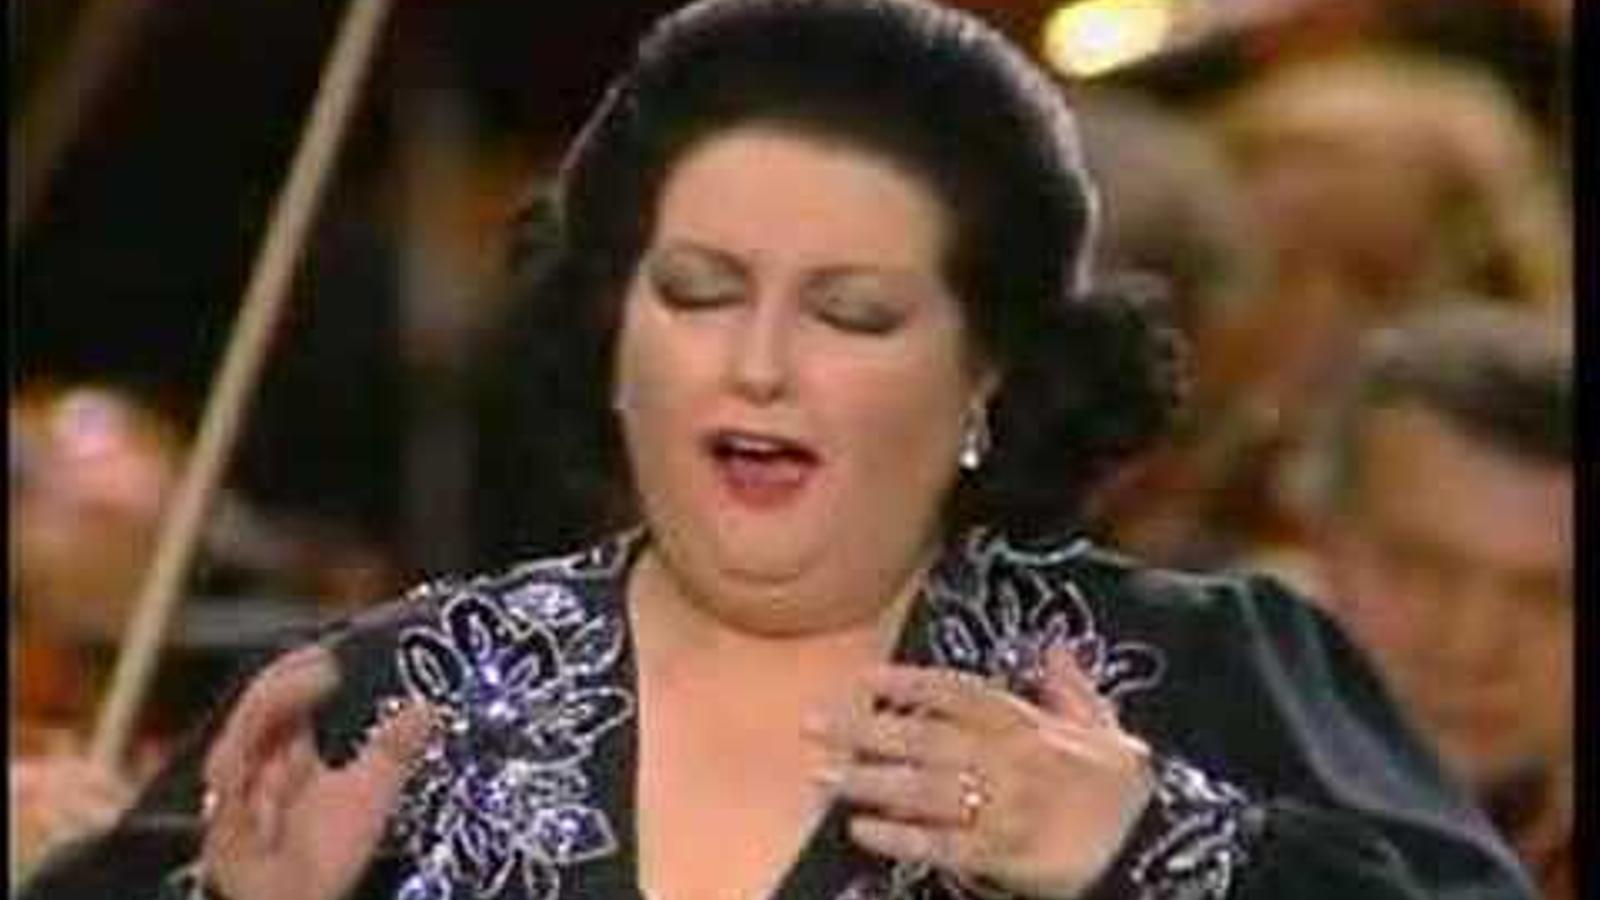 Montserrat Caballé interpretant l'ària de Puccini 'O mio babbino caro'